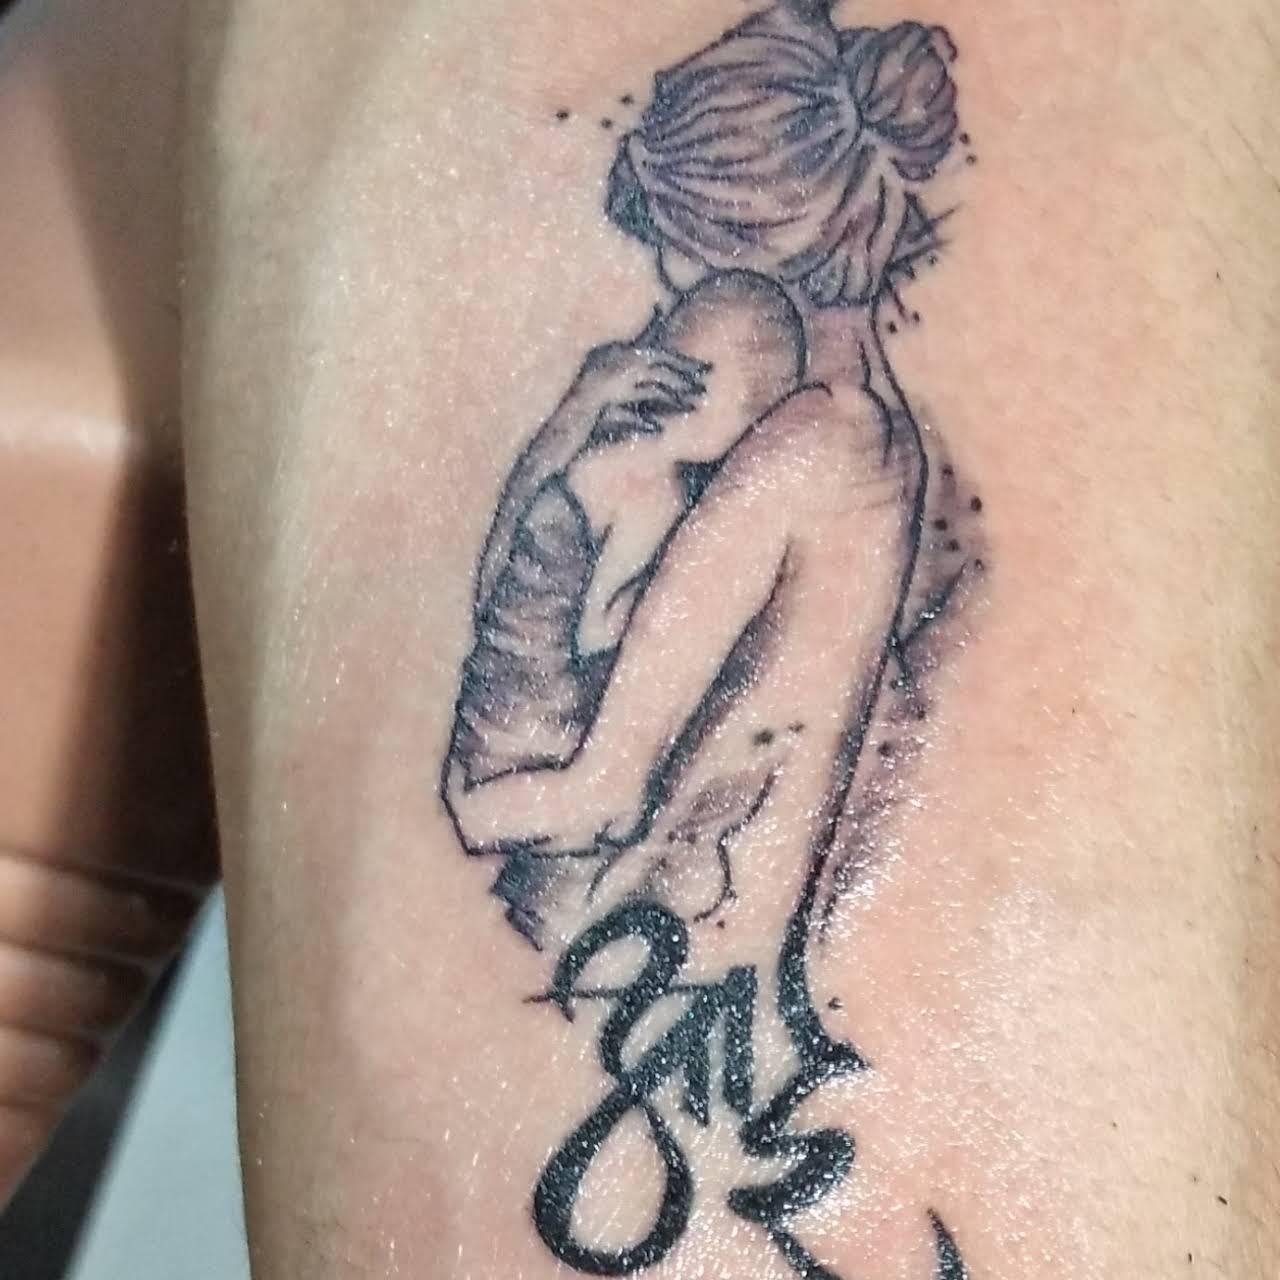 Aj Tattoozz We Do All Types Of Permanent Tattoos Like Oriental